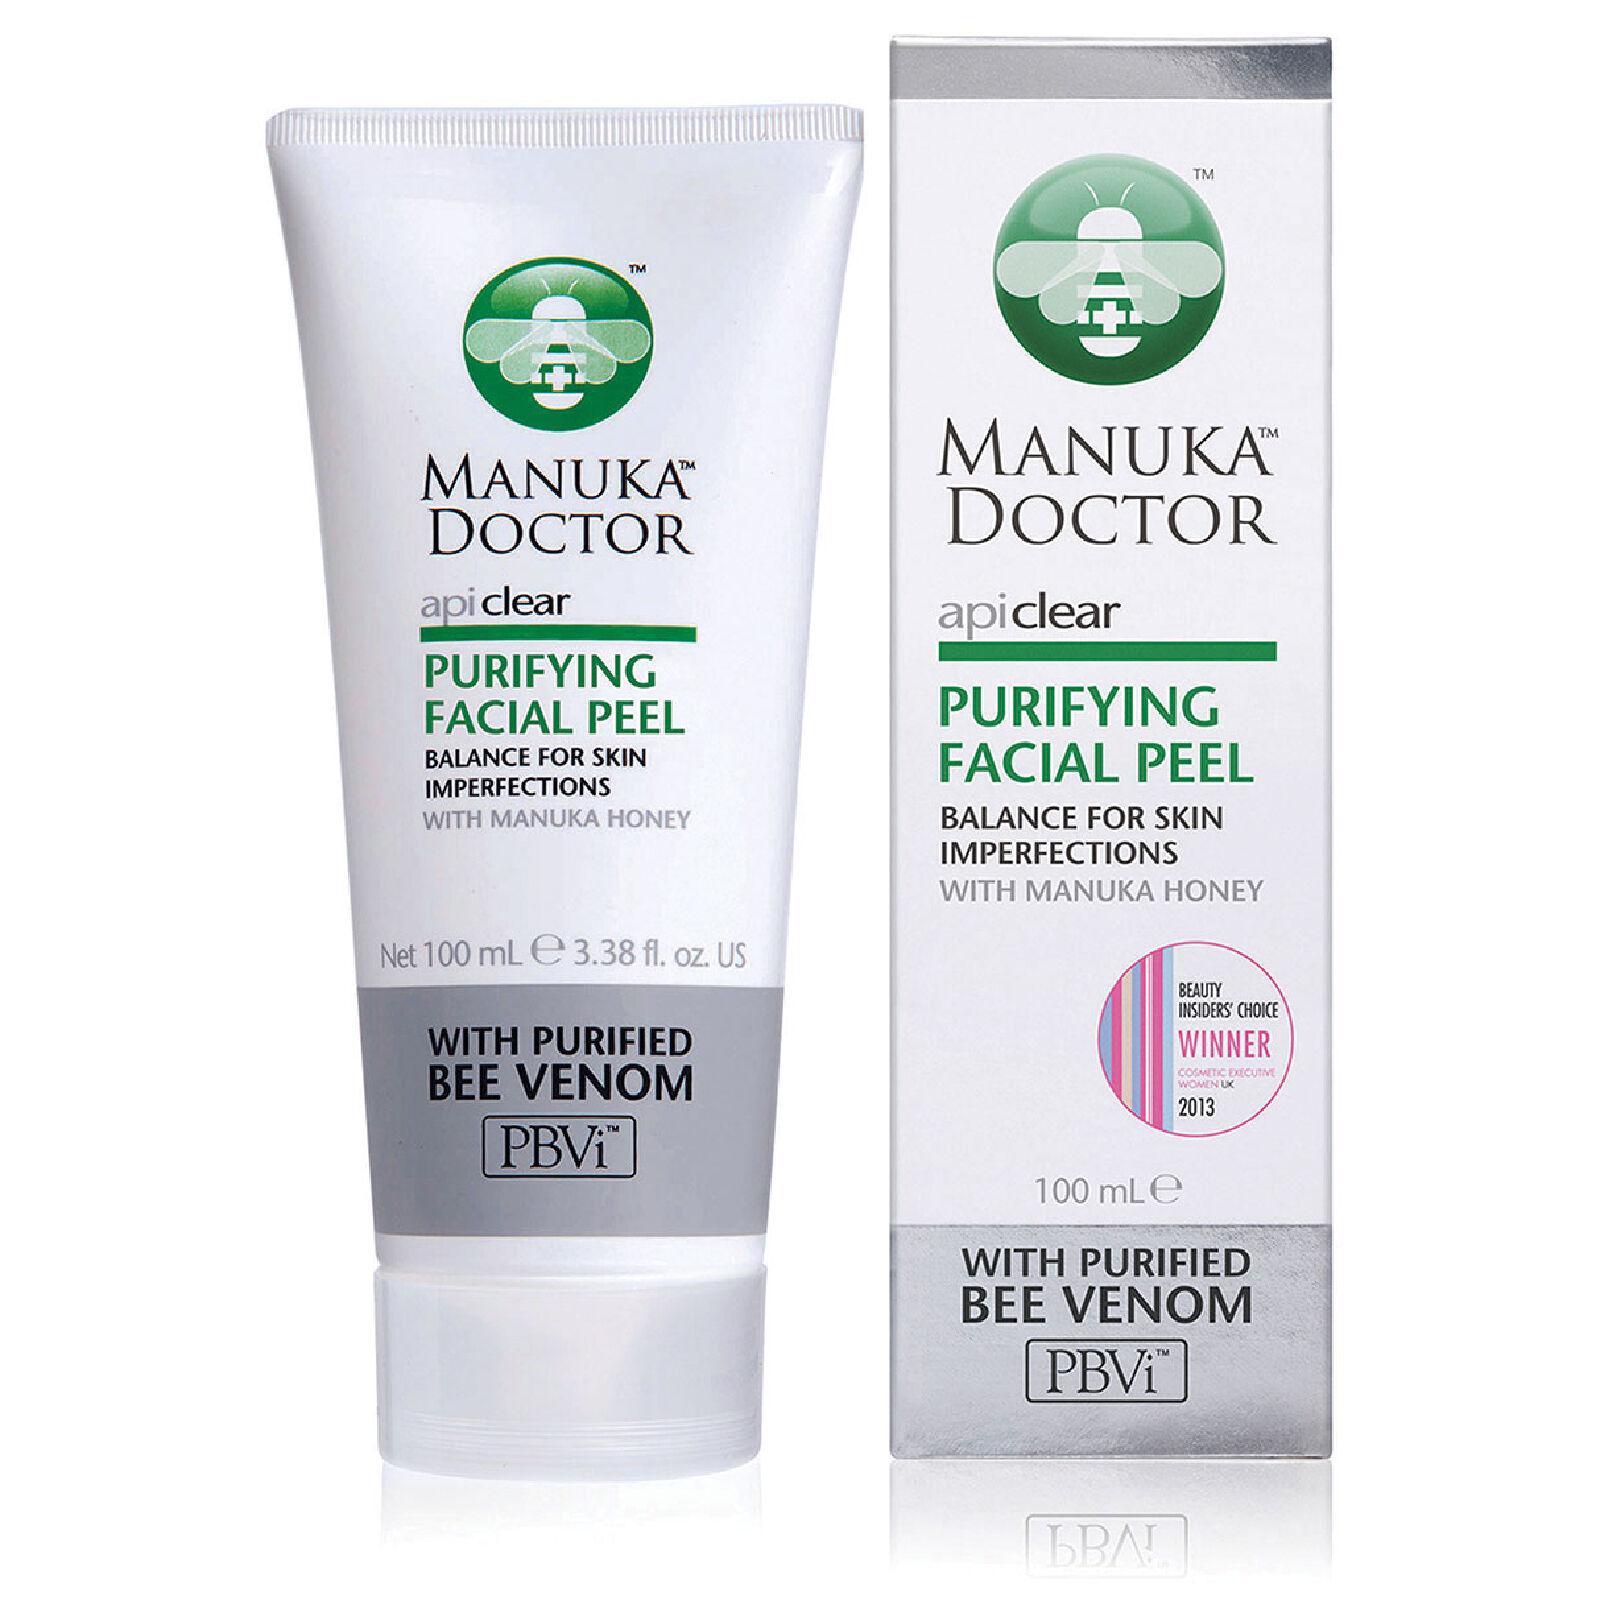 Manuka Doctor Peeling FacialApiClearManuka Doctor100 ml